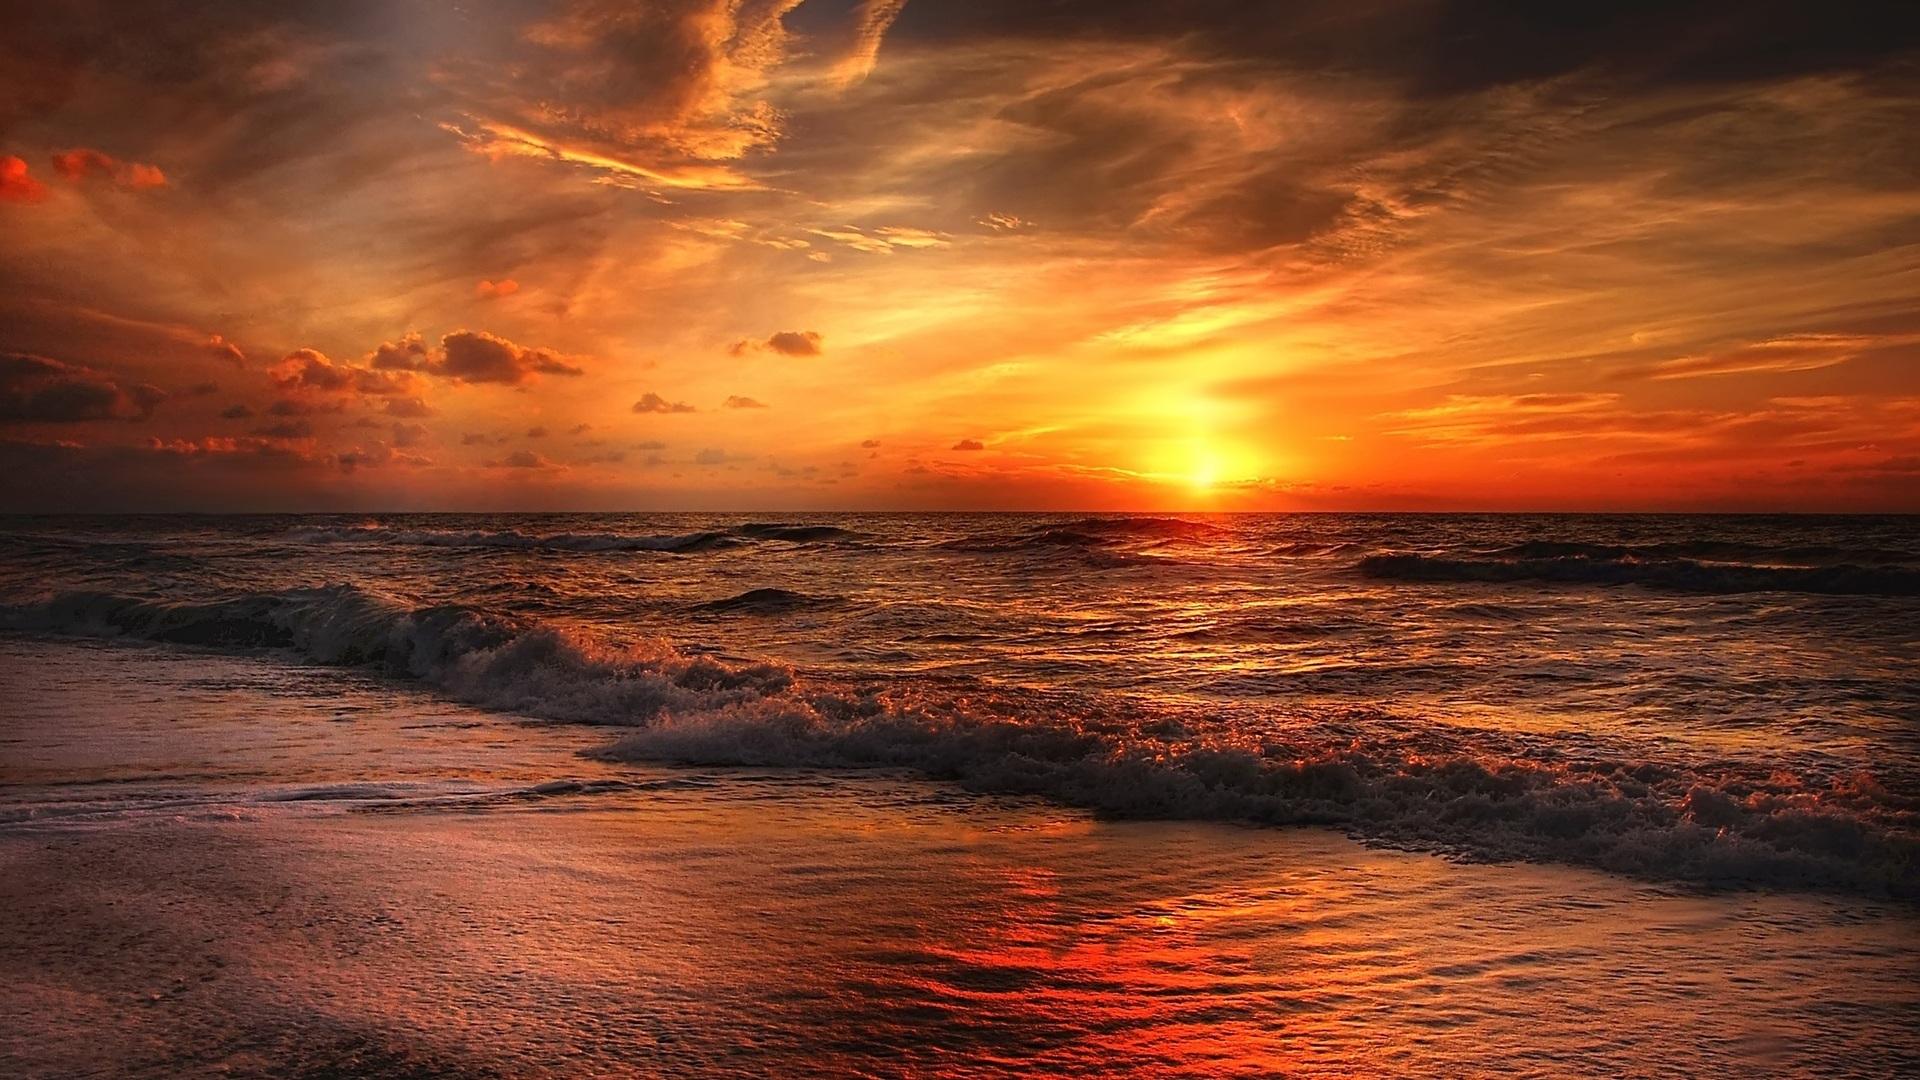 1920x1080 sunset beach laptop